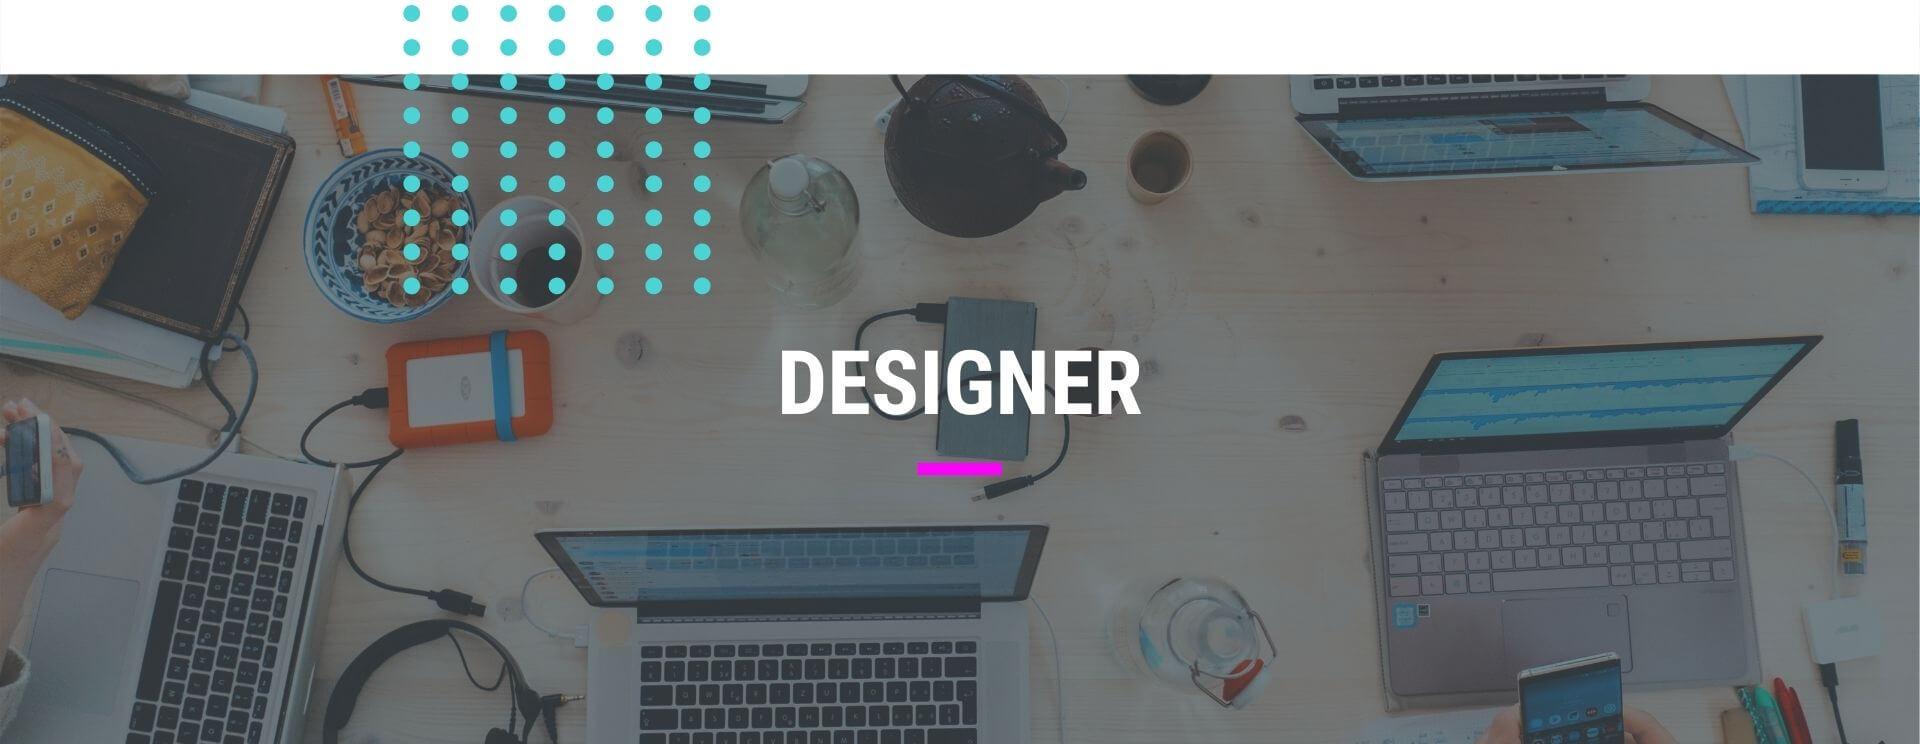 Career Banner Image